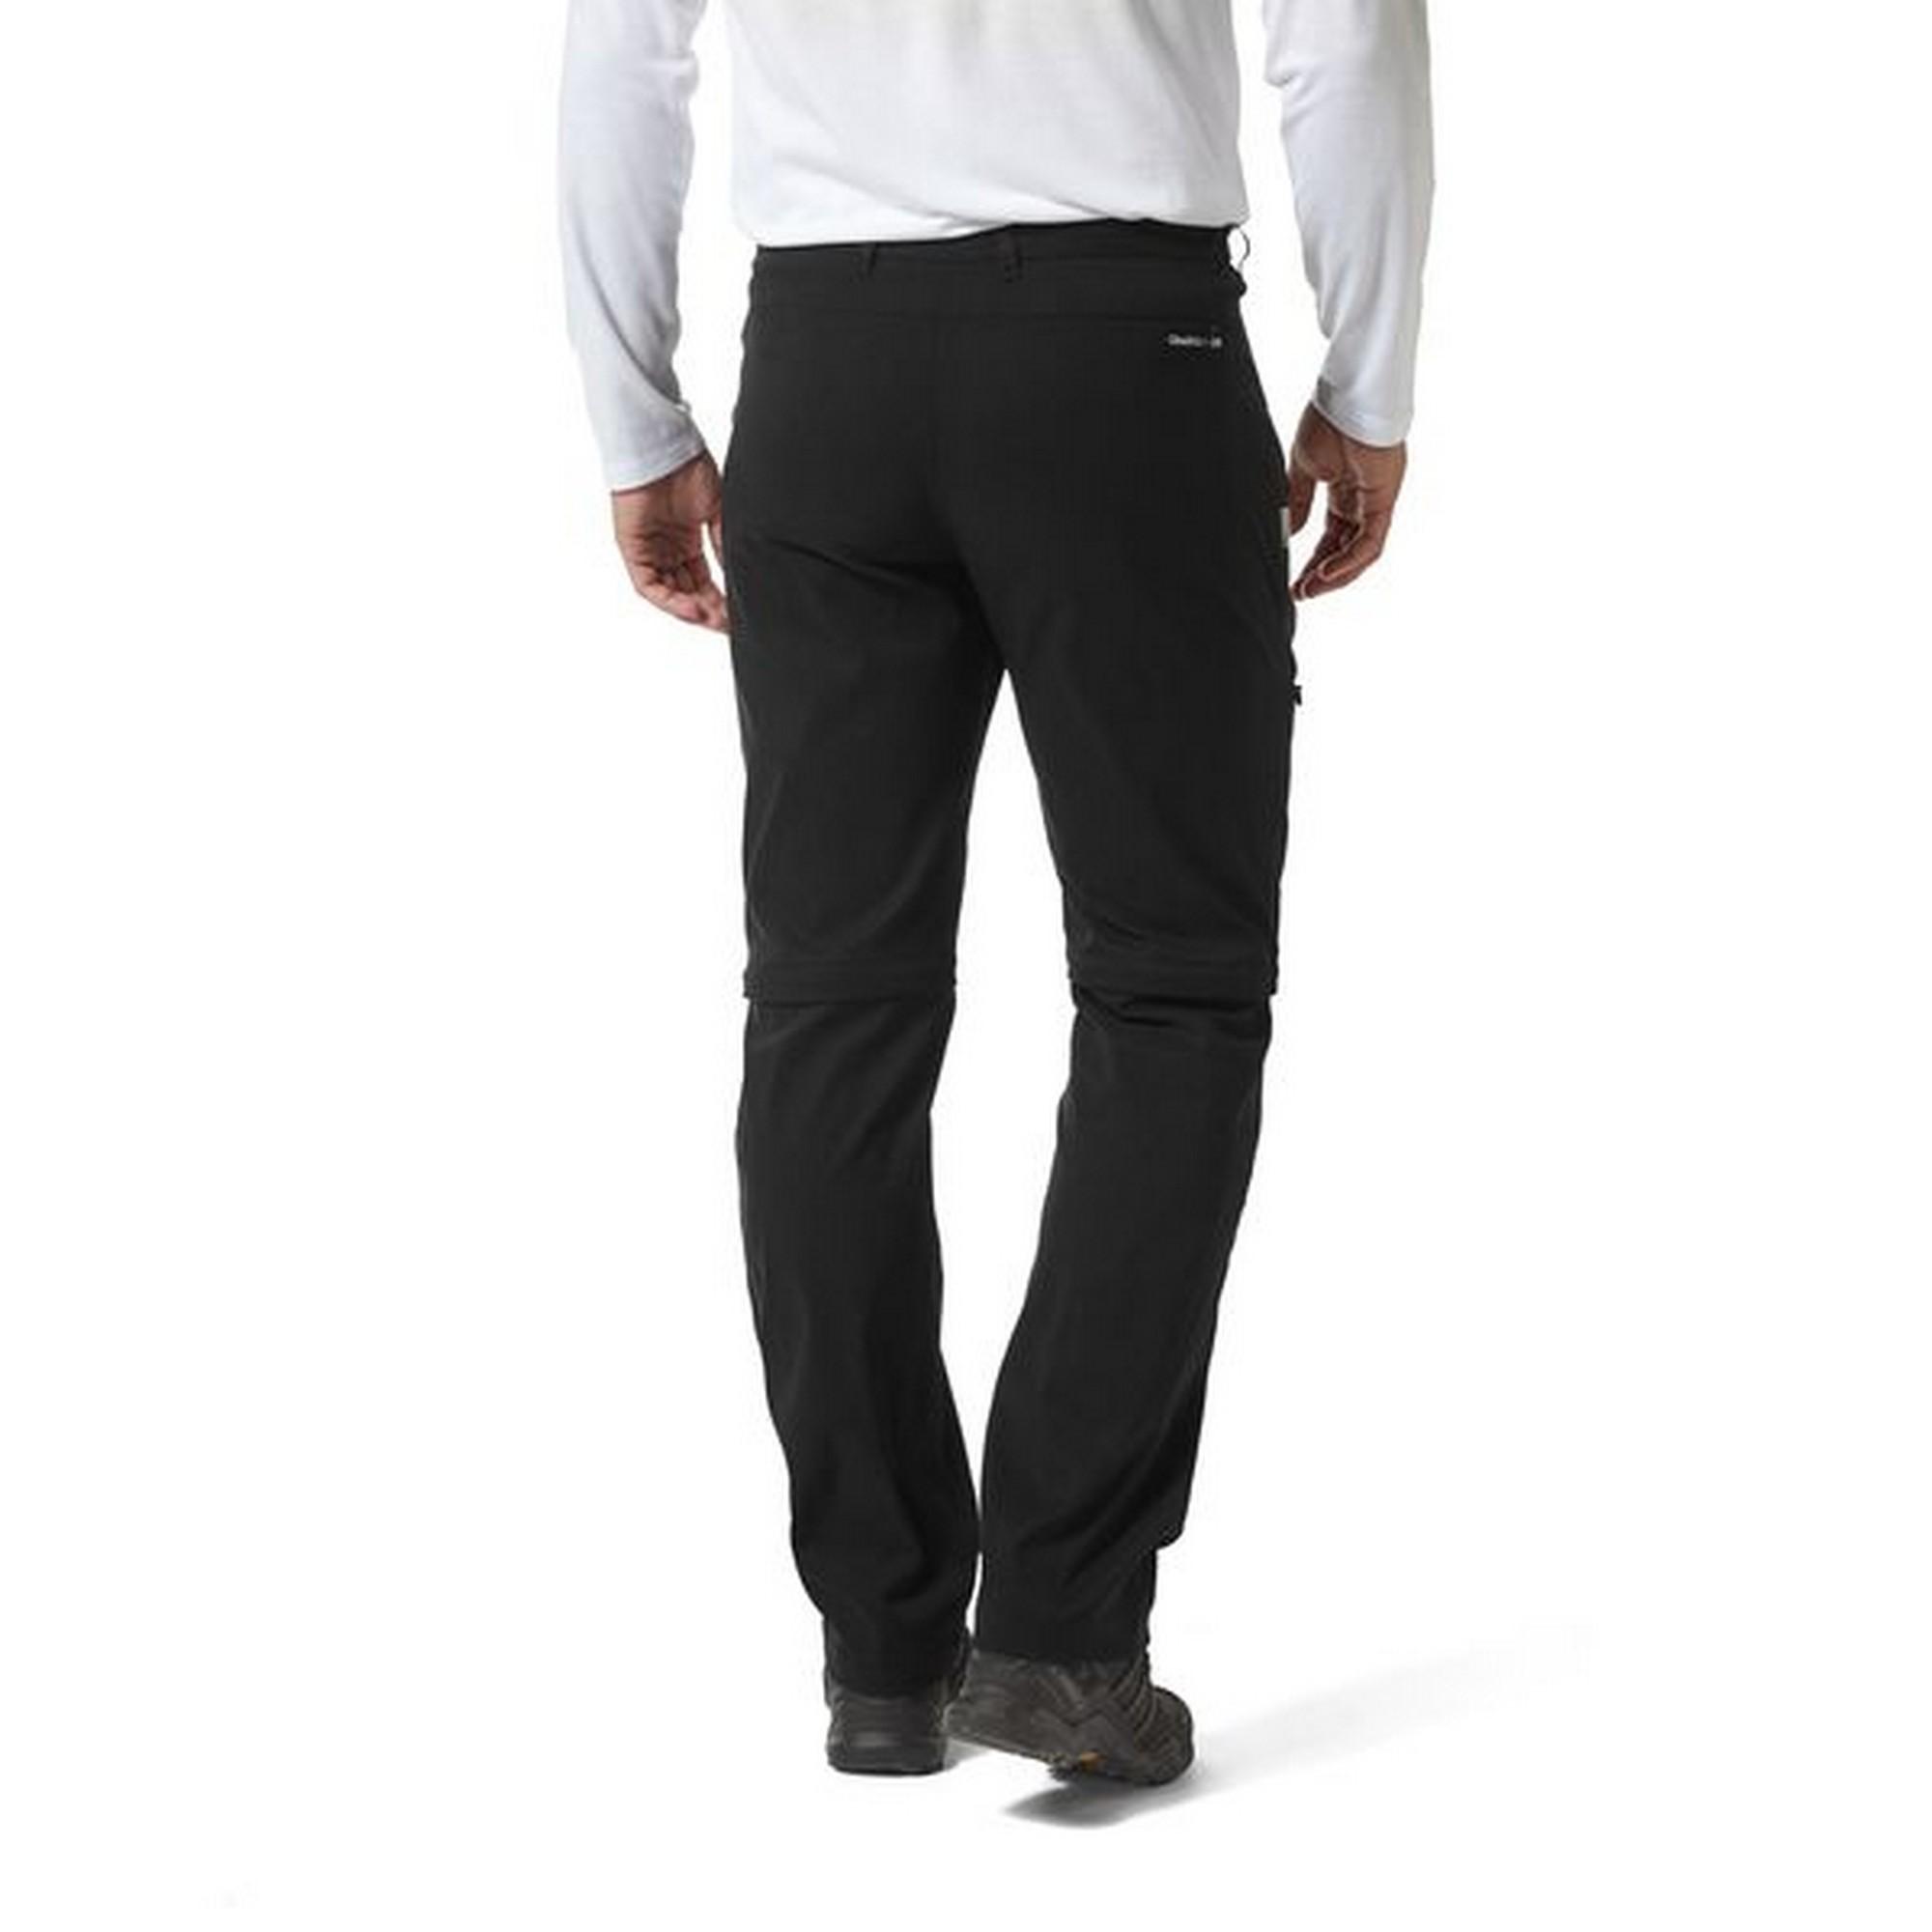 Craghoppers Mens Kiwi Pro II Trousers Black